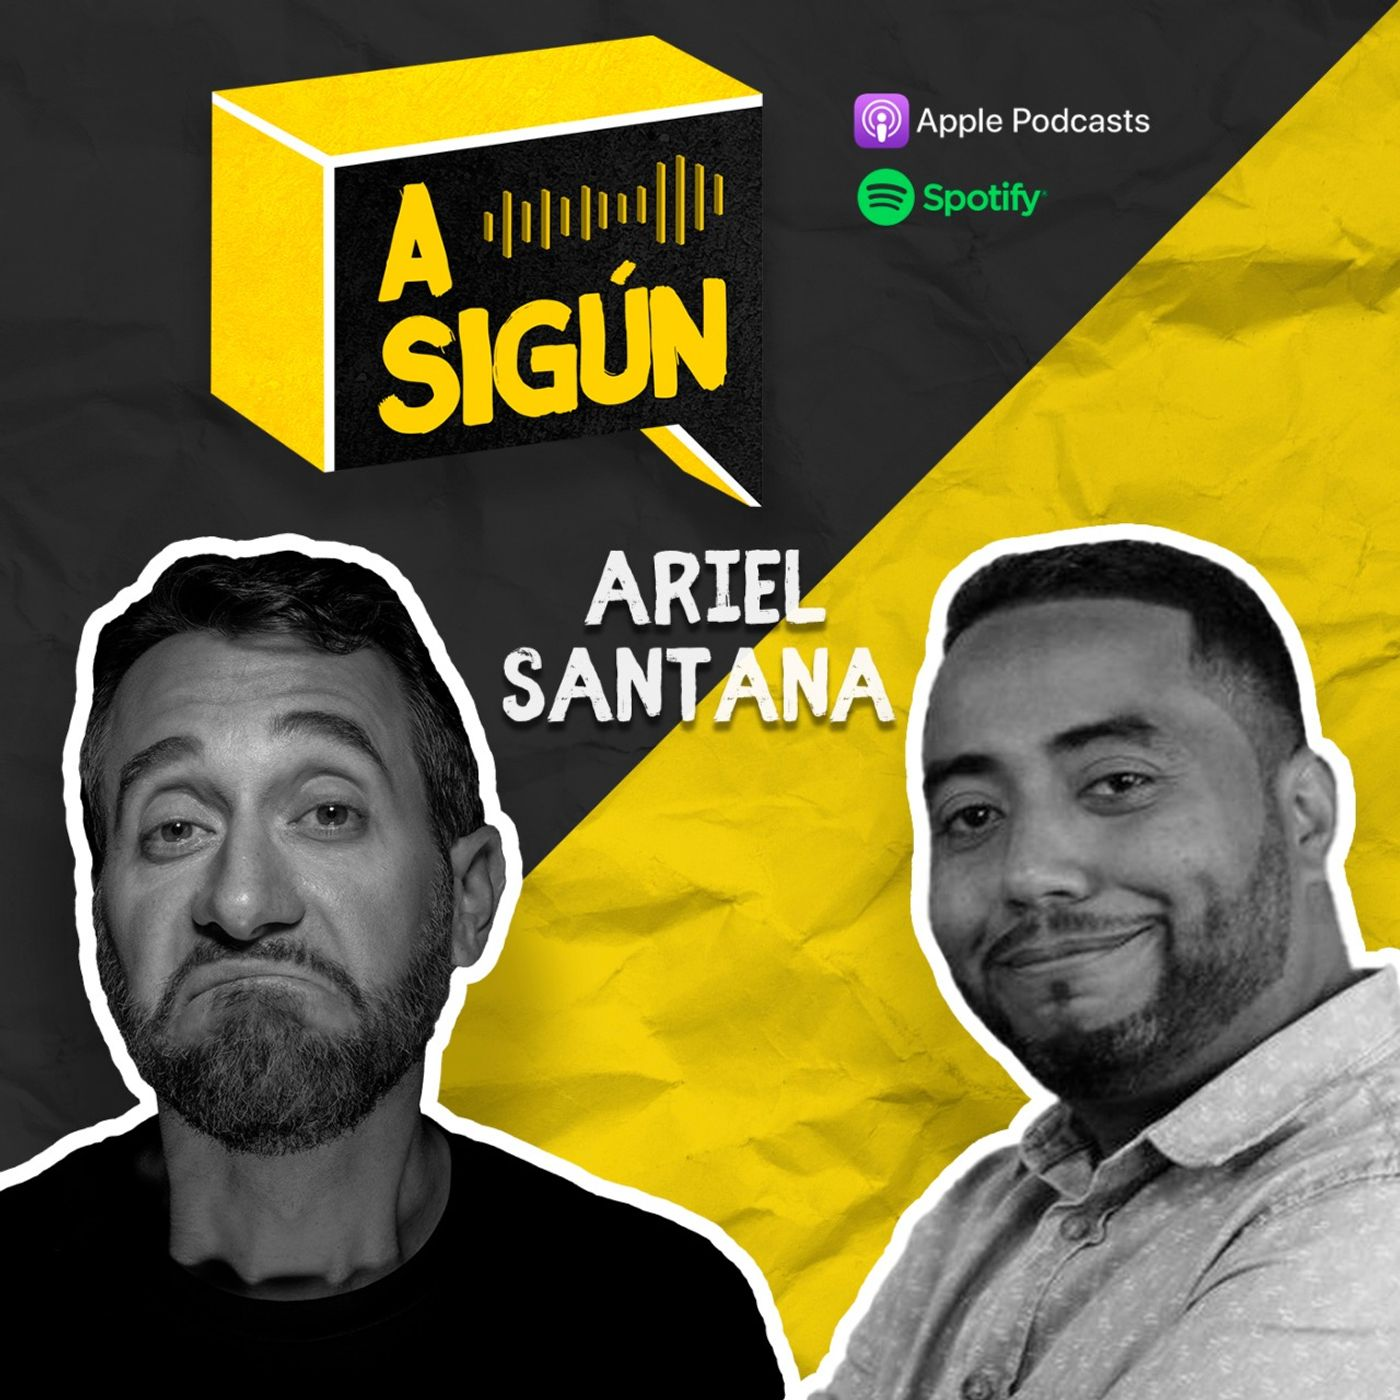 002. A SIGÚN: Ariel Santana.